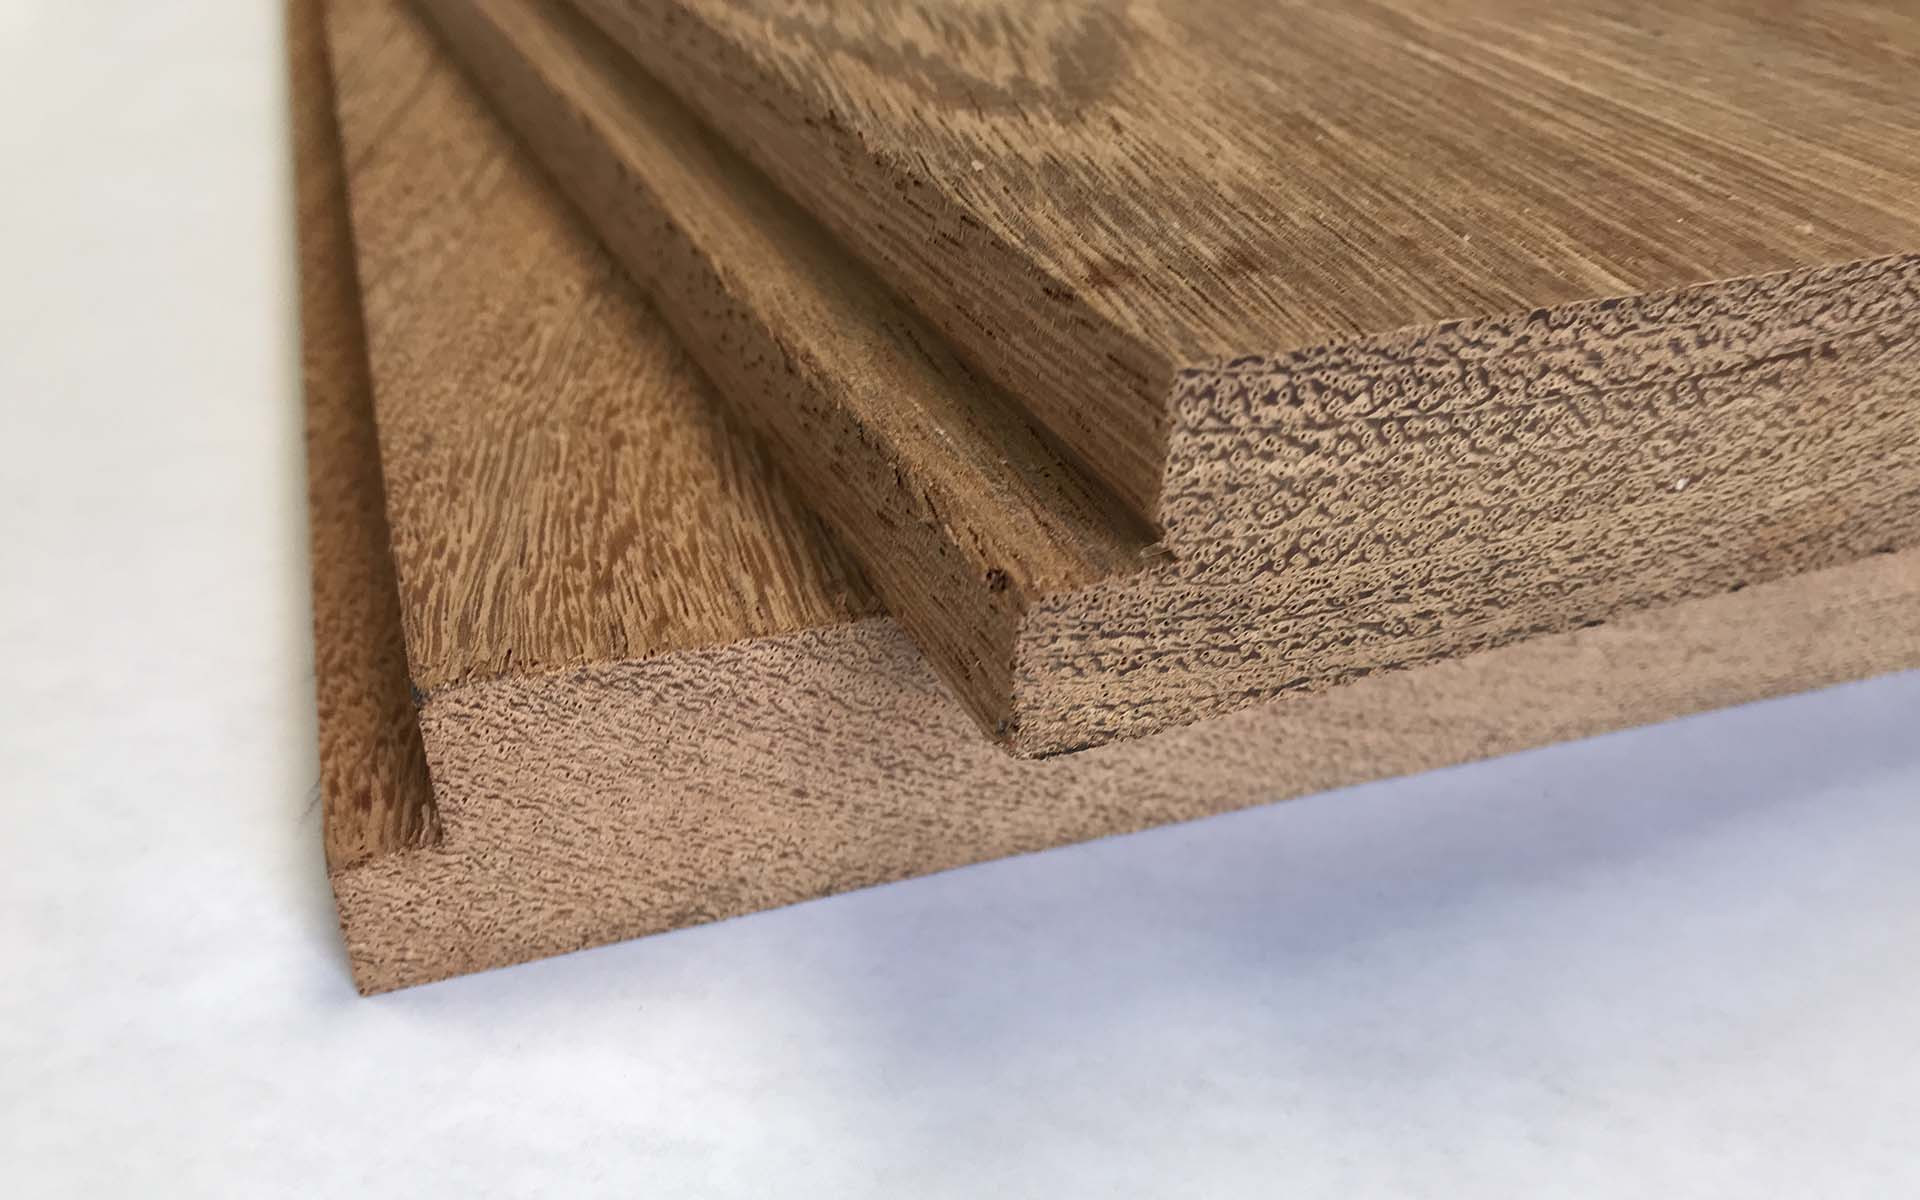 3 4 inch hardwood flooring prices of buy trailer decking apitong shiplap rough boards truck flooring in 3 angelim pedra shiplap close up 4